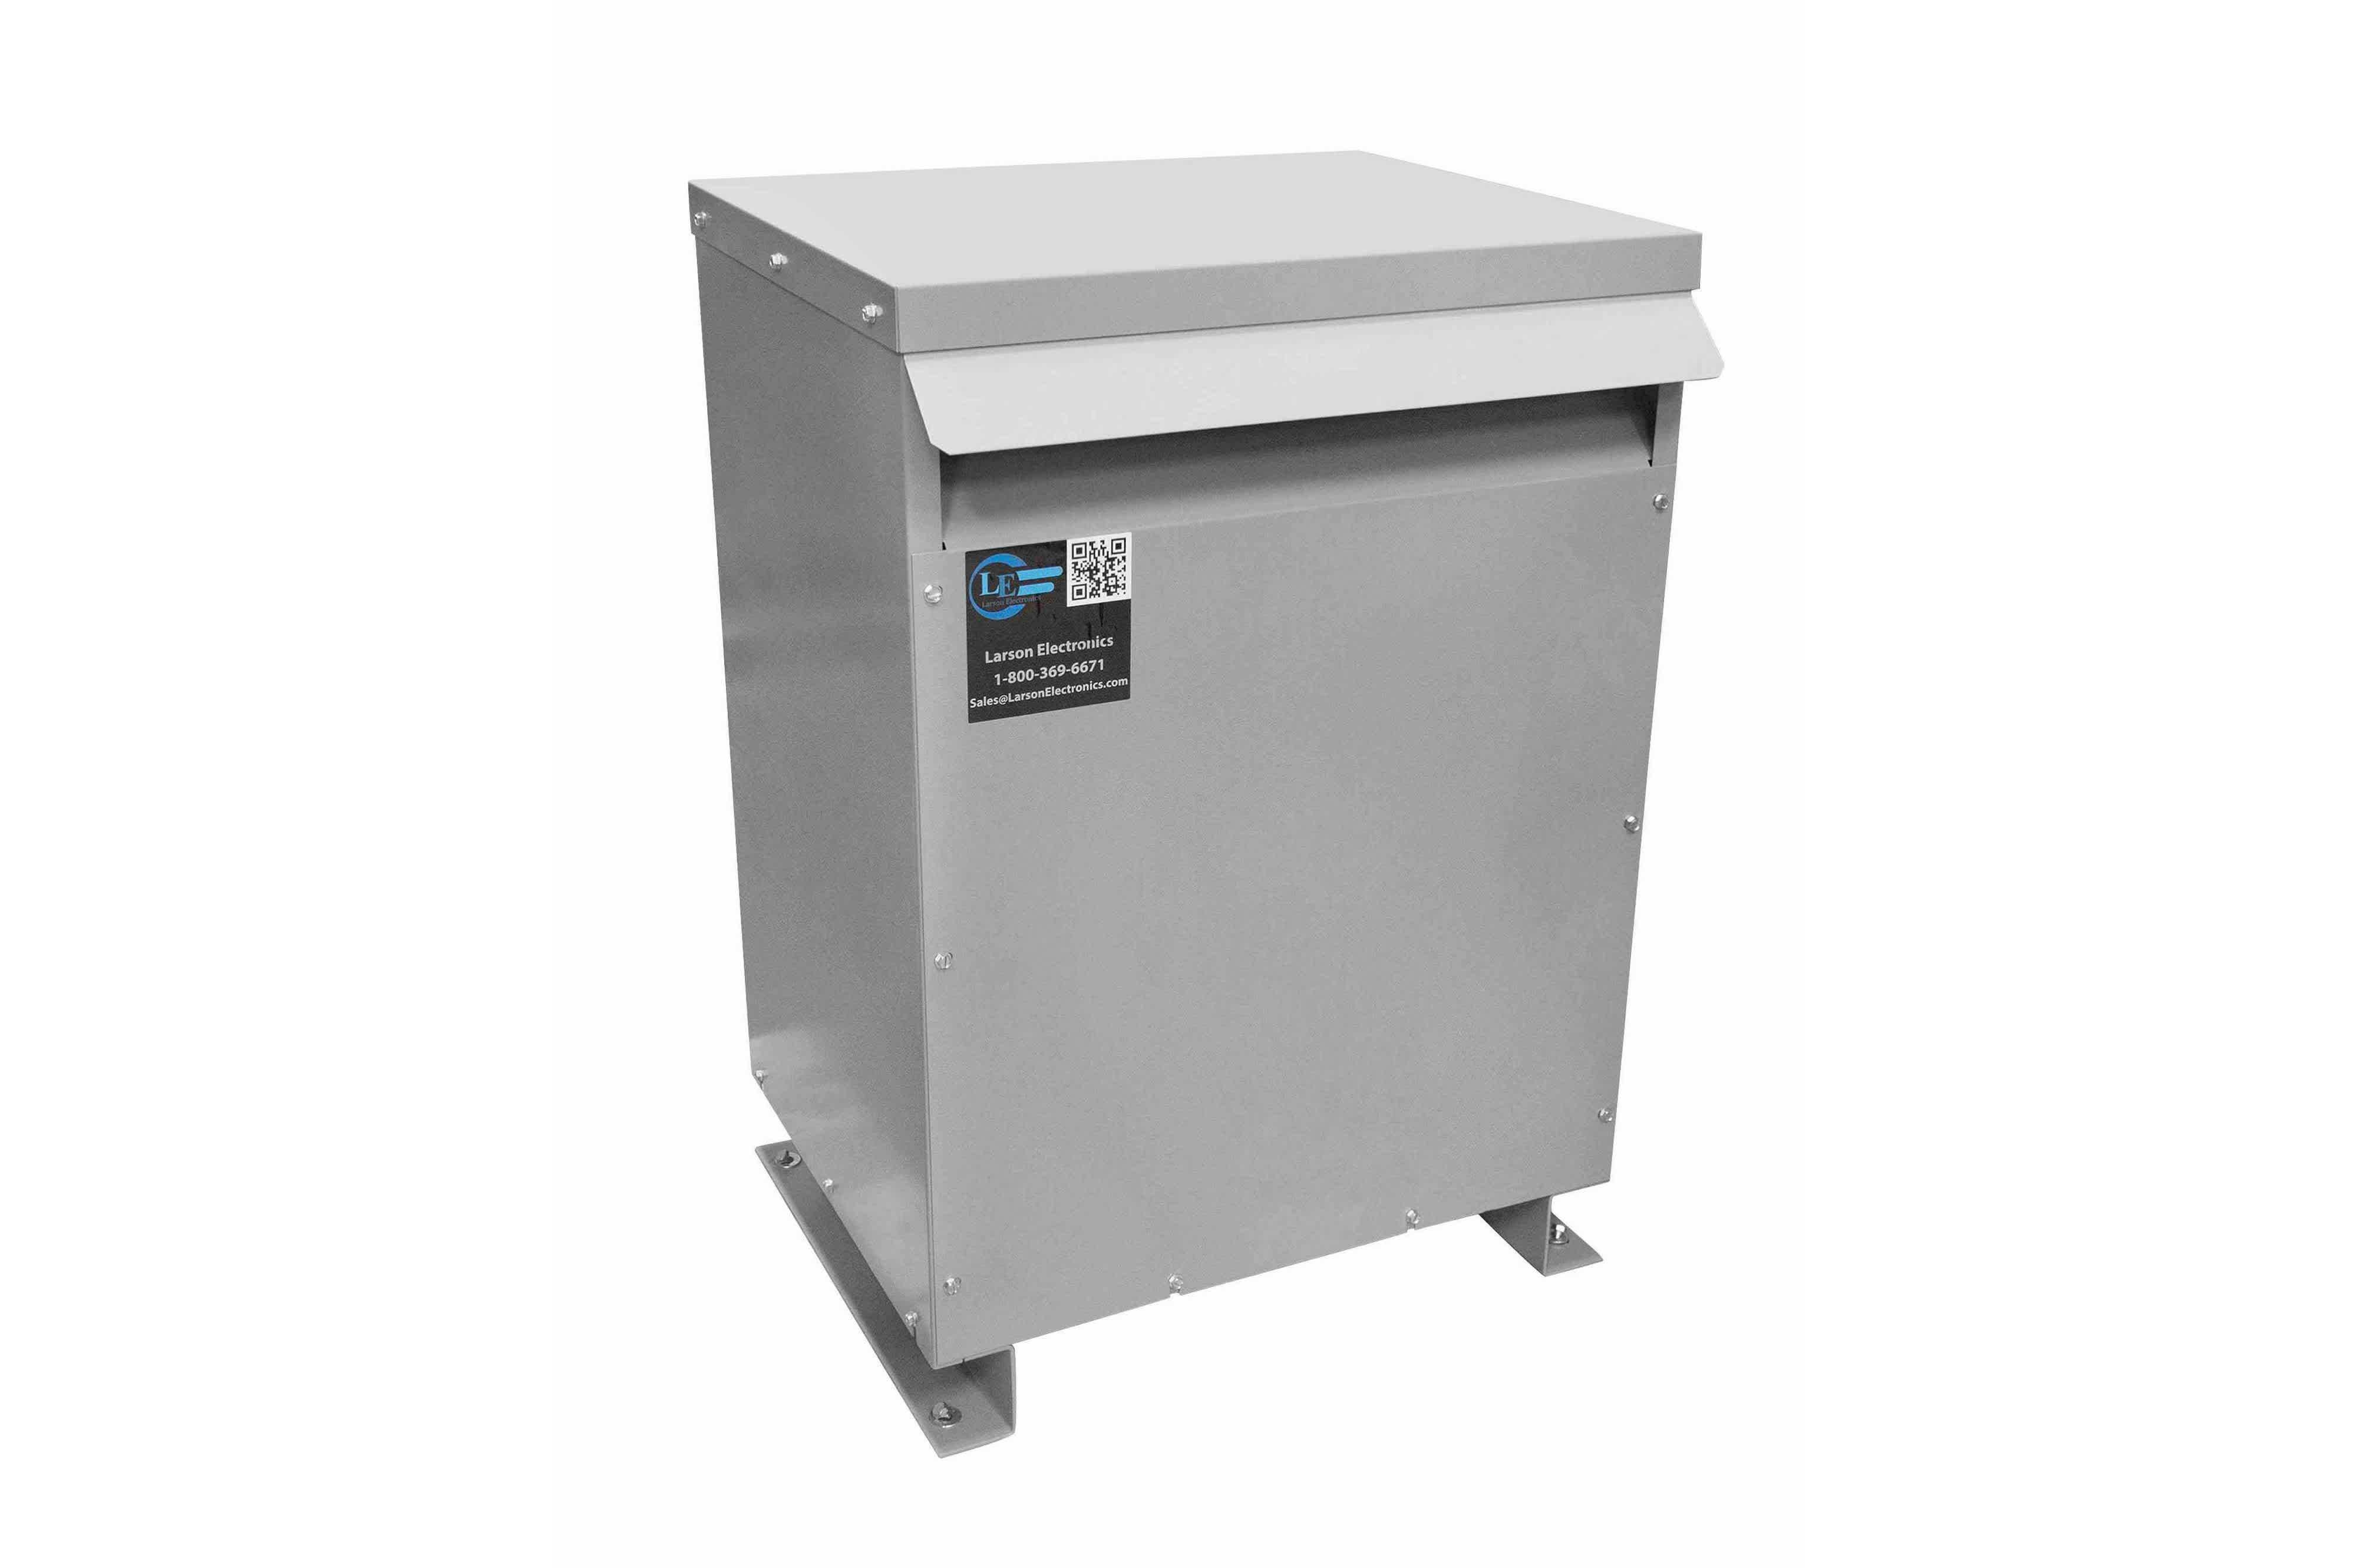 200 kVA 3PH DOE Transformer, 480V Delta Primary, 380Y/220 Wye-N Secondary, N3R, Ventilated, 60 Hz